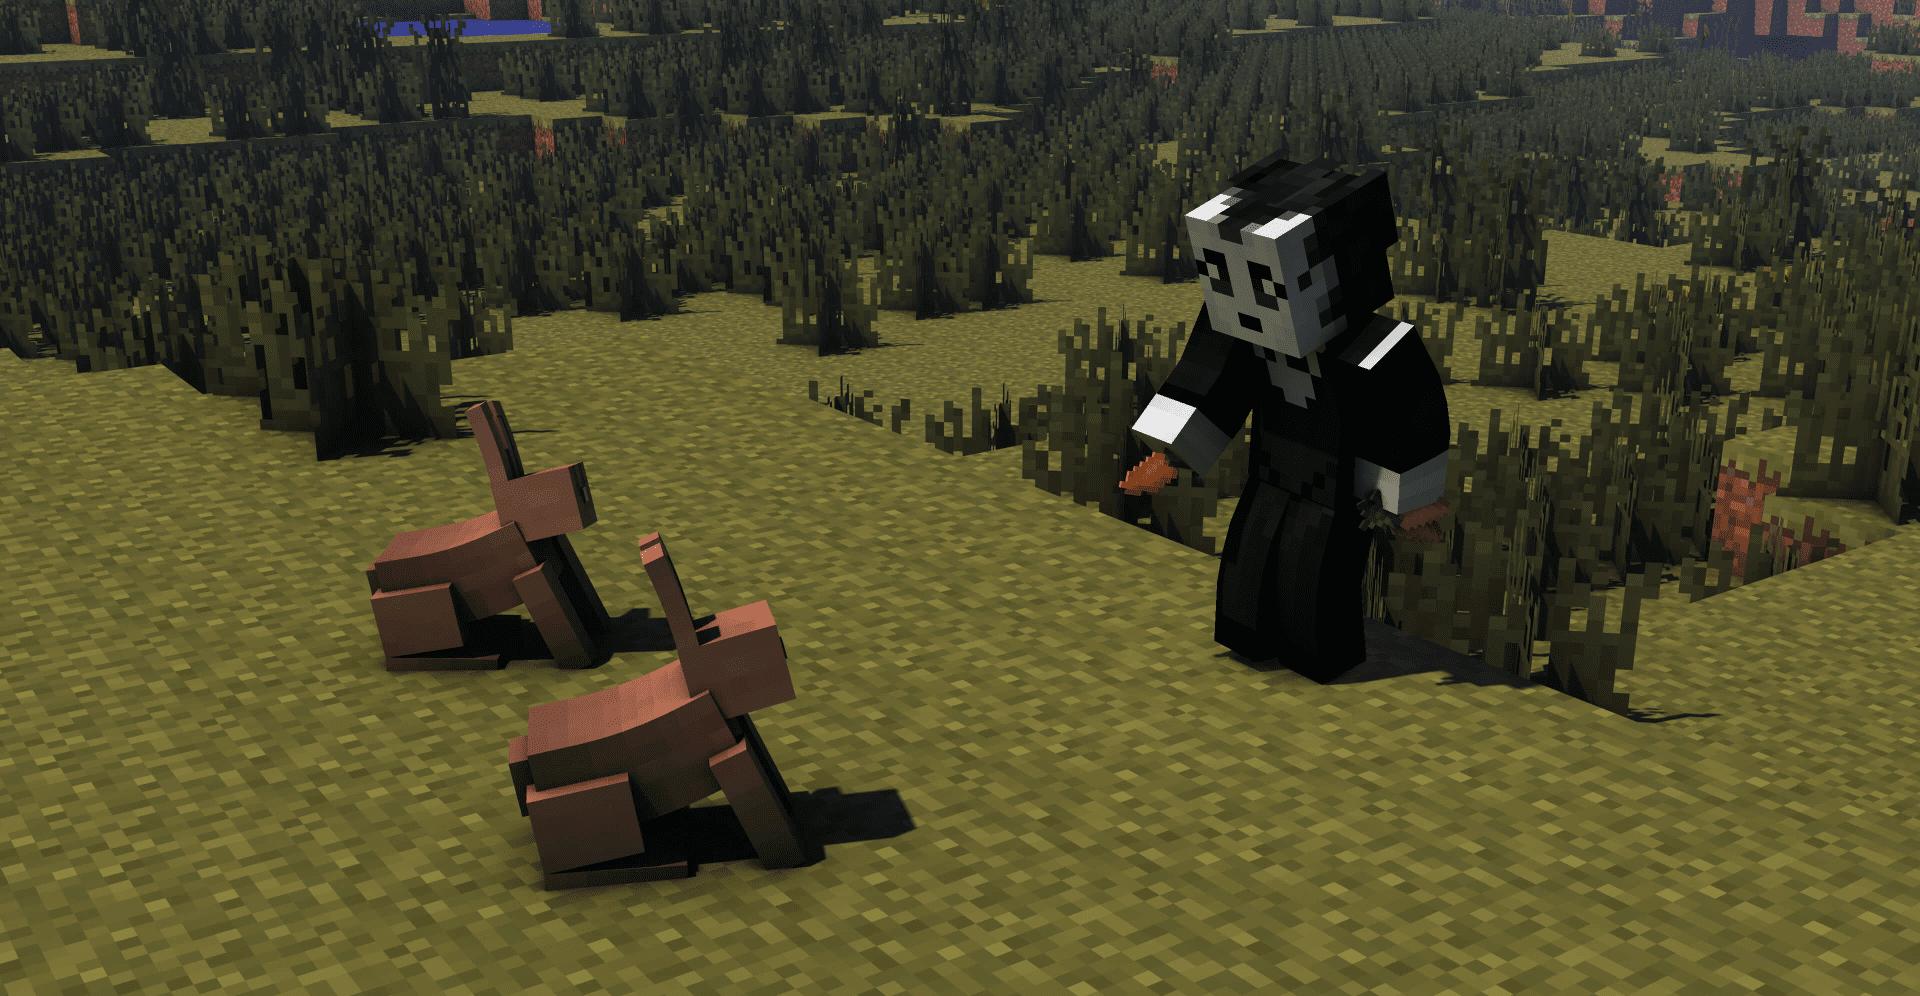 Adult Minecraft Server | Minecraft Survival Server | Minecraft Server for Adults | TogetherCraft